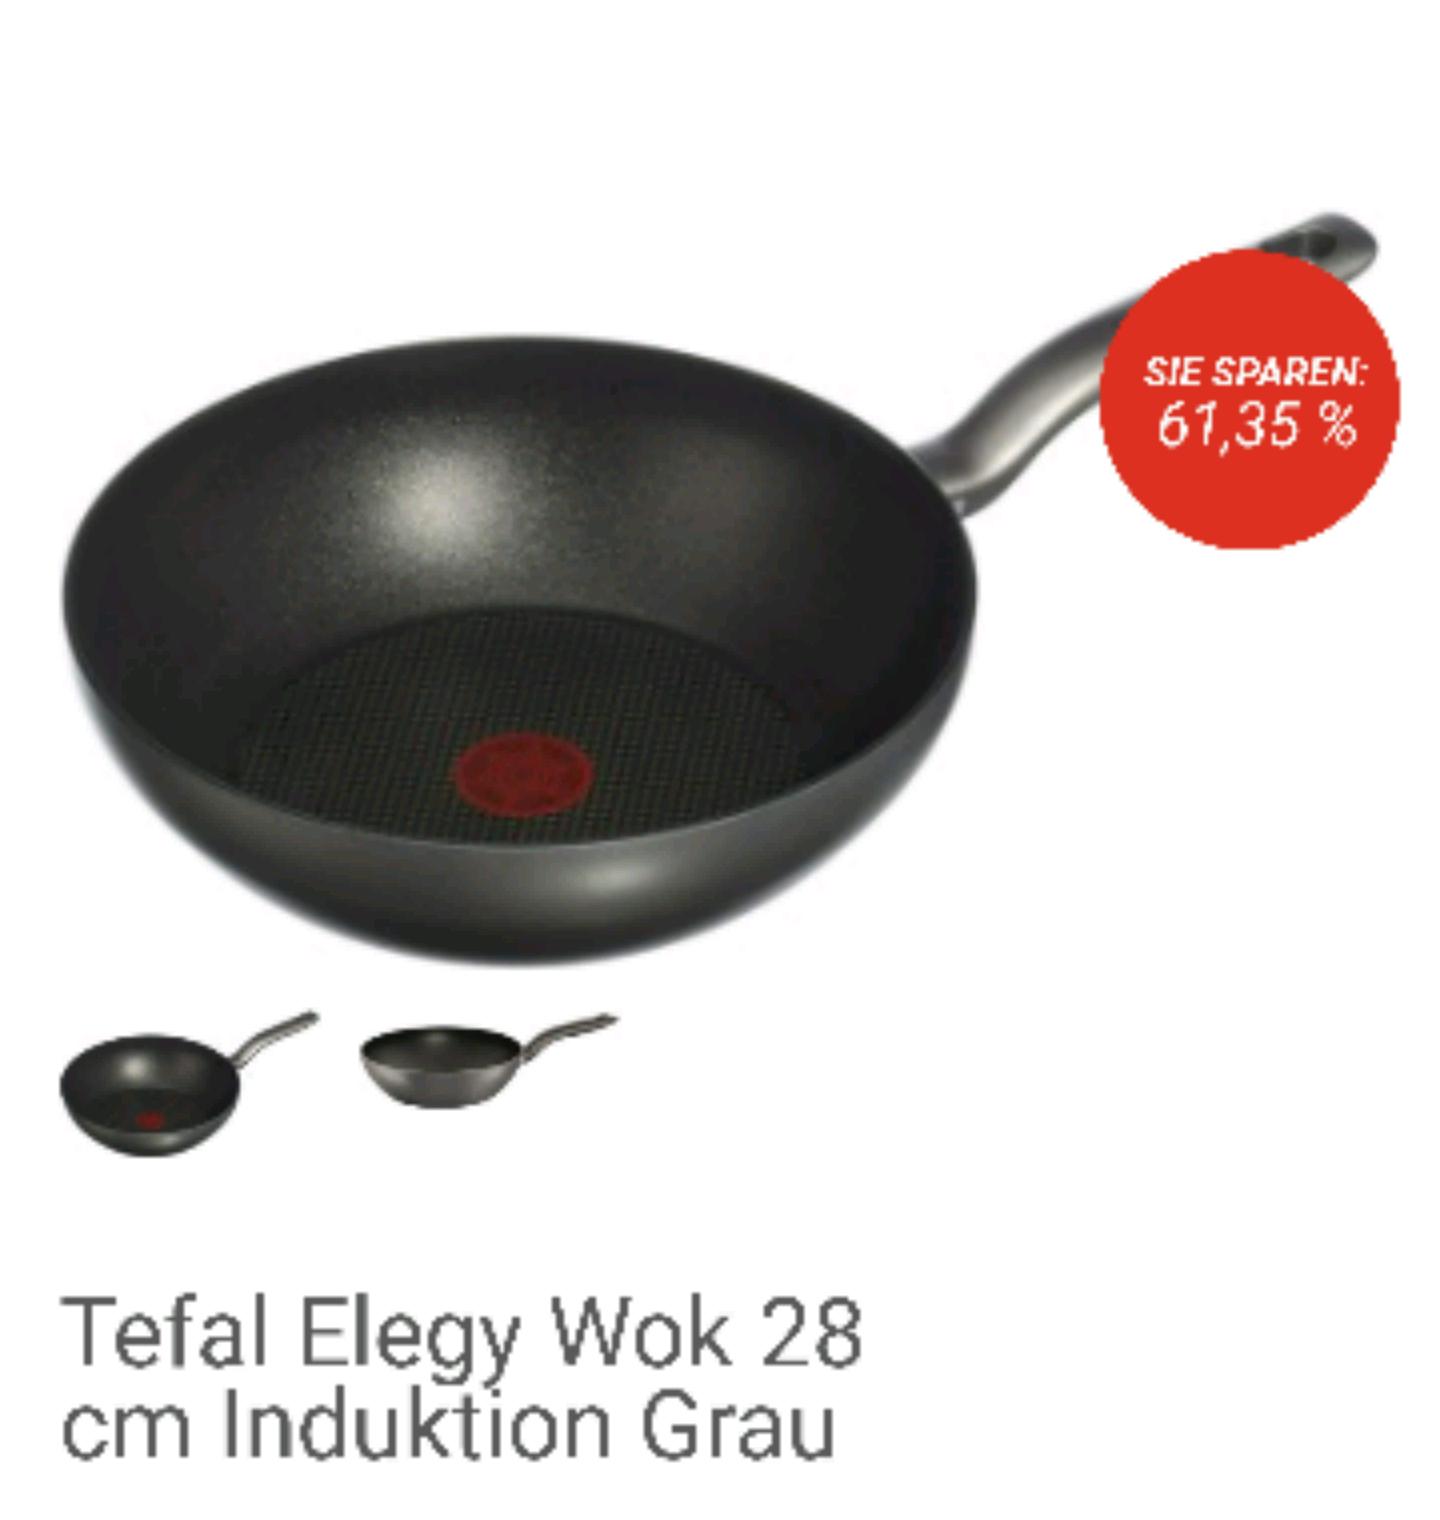 Tefal Elegy Wok 28 cm Induktion Grau bei top12